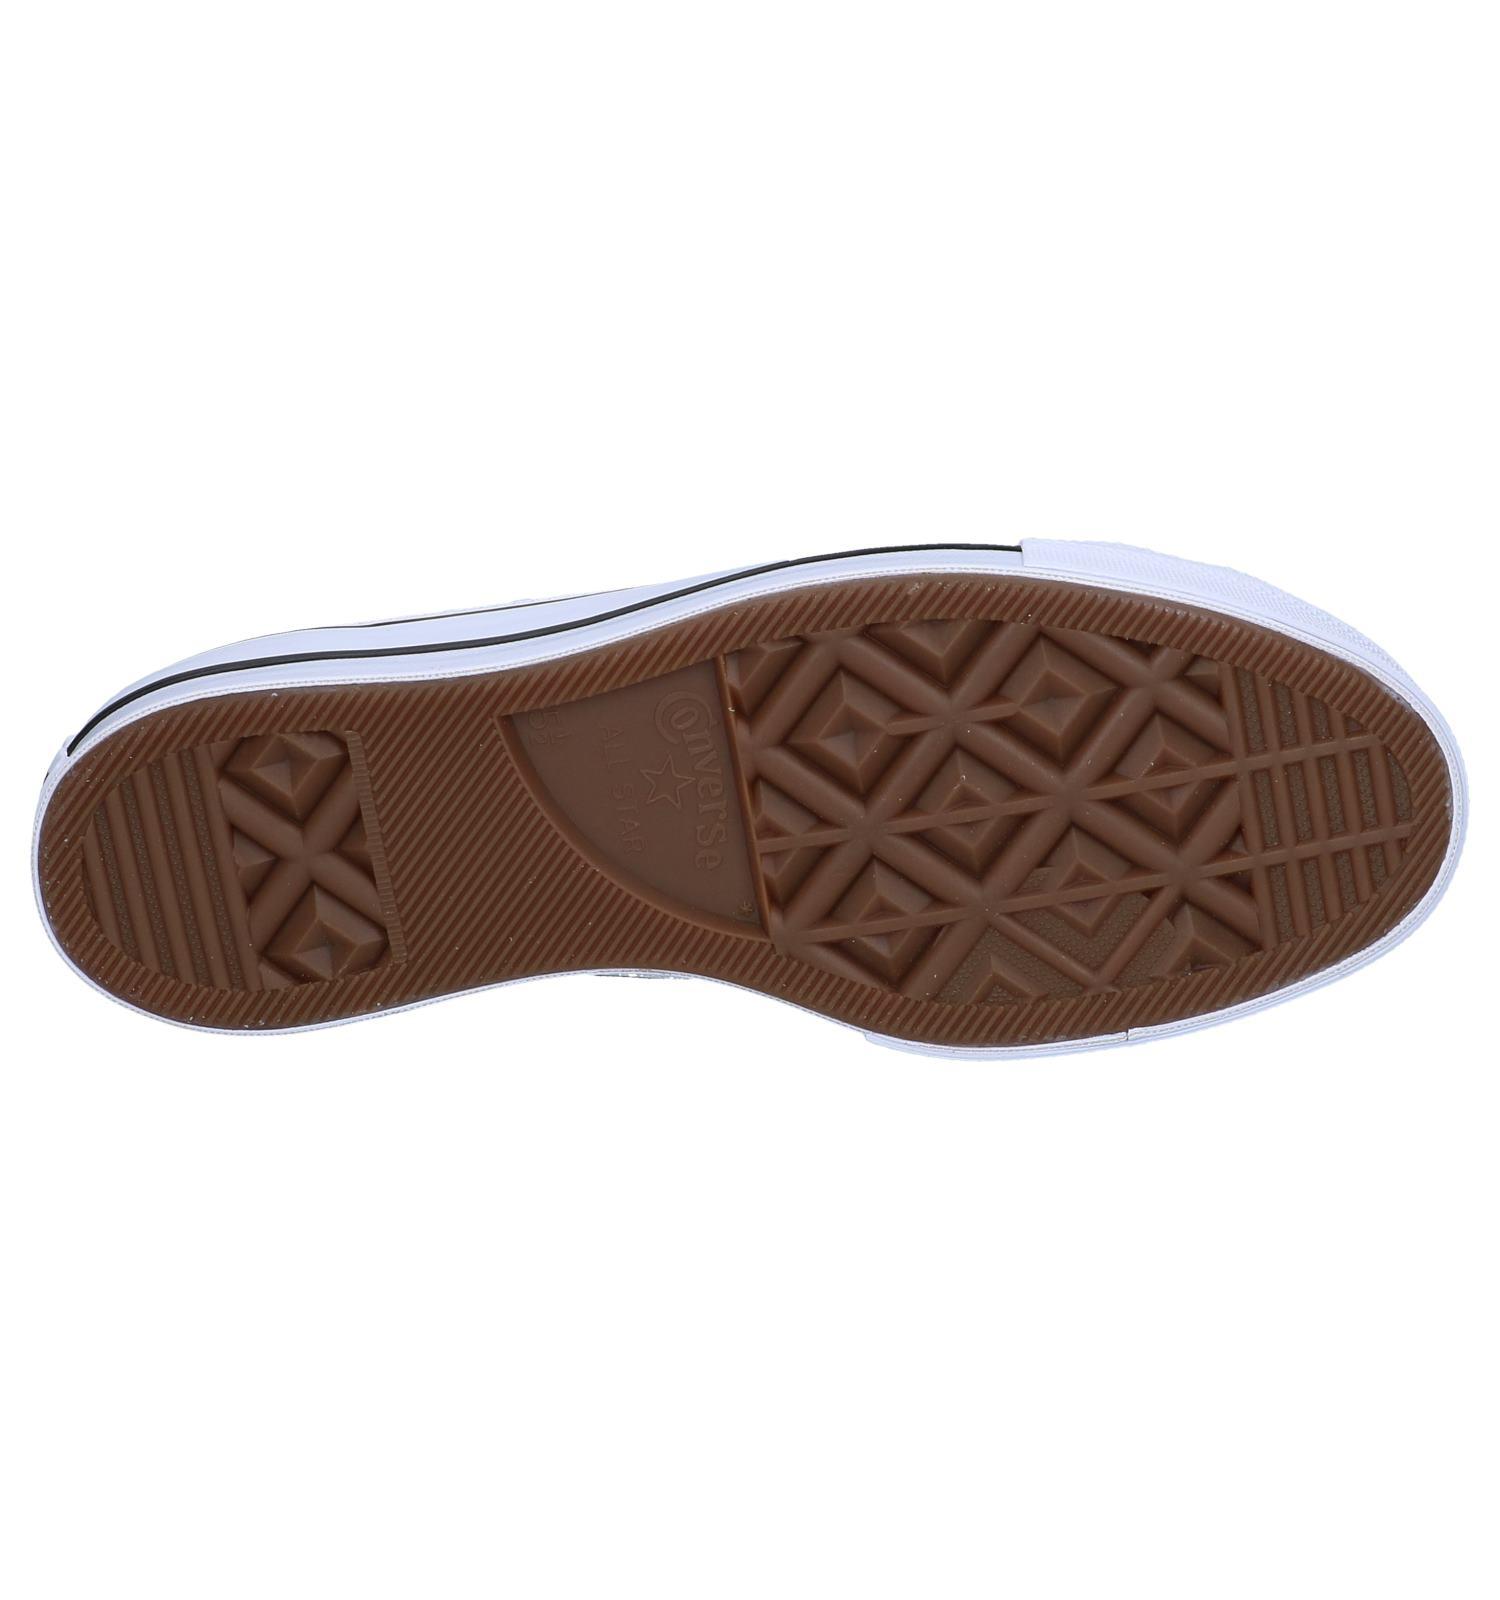 Lift Ox Sneakers Converse Star All Witte SMGqpjVLUz